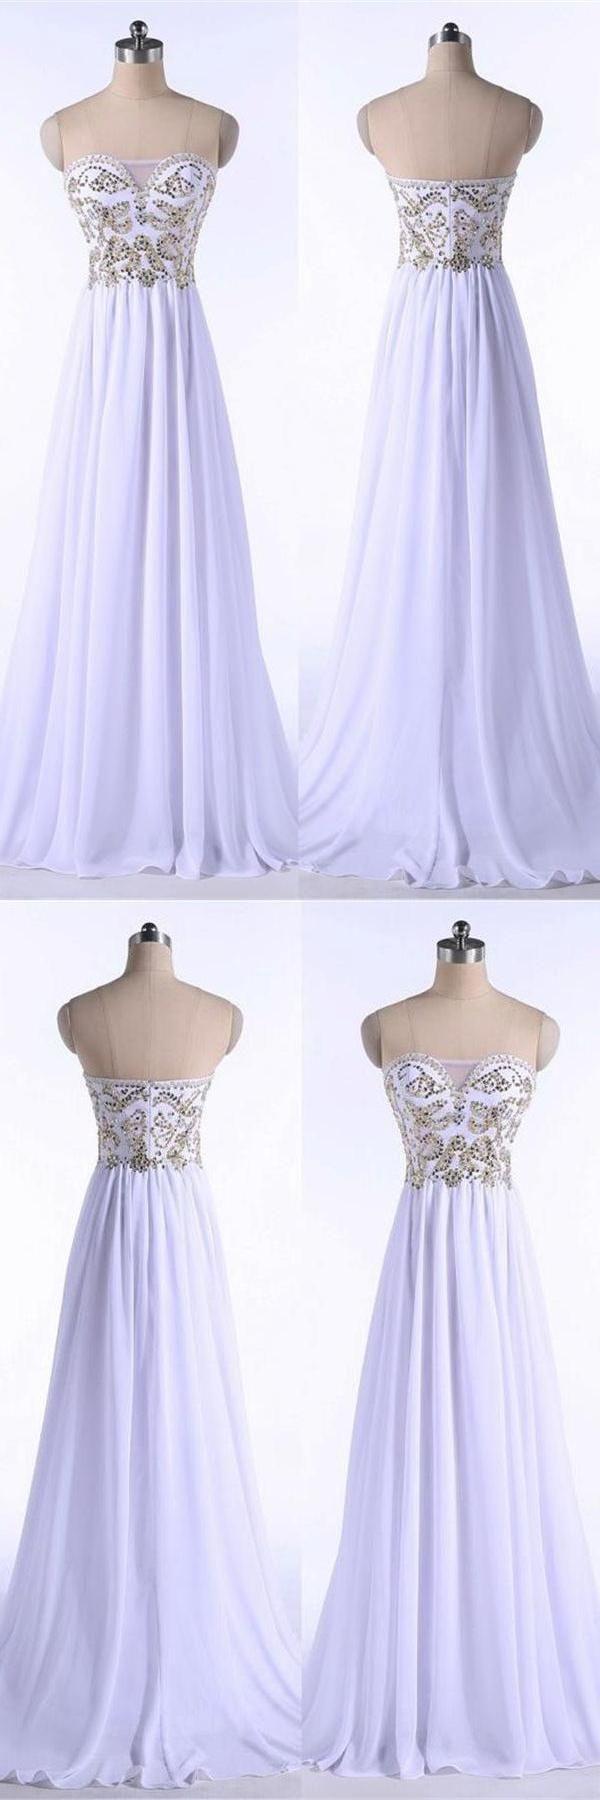 Prom dresses white cheap prom dresses prom dresses chiffon prom